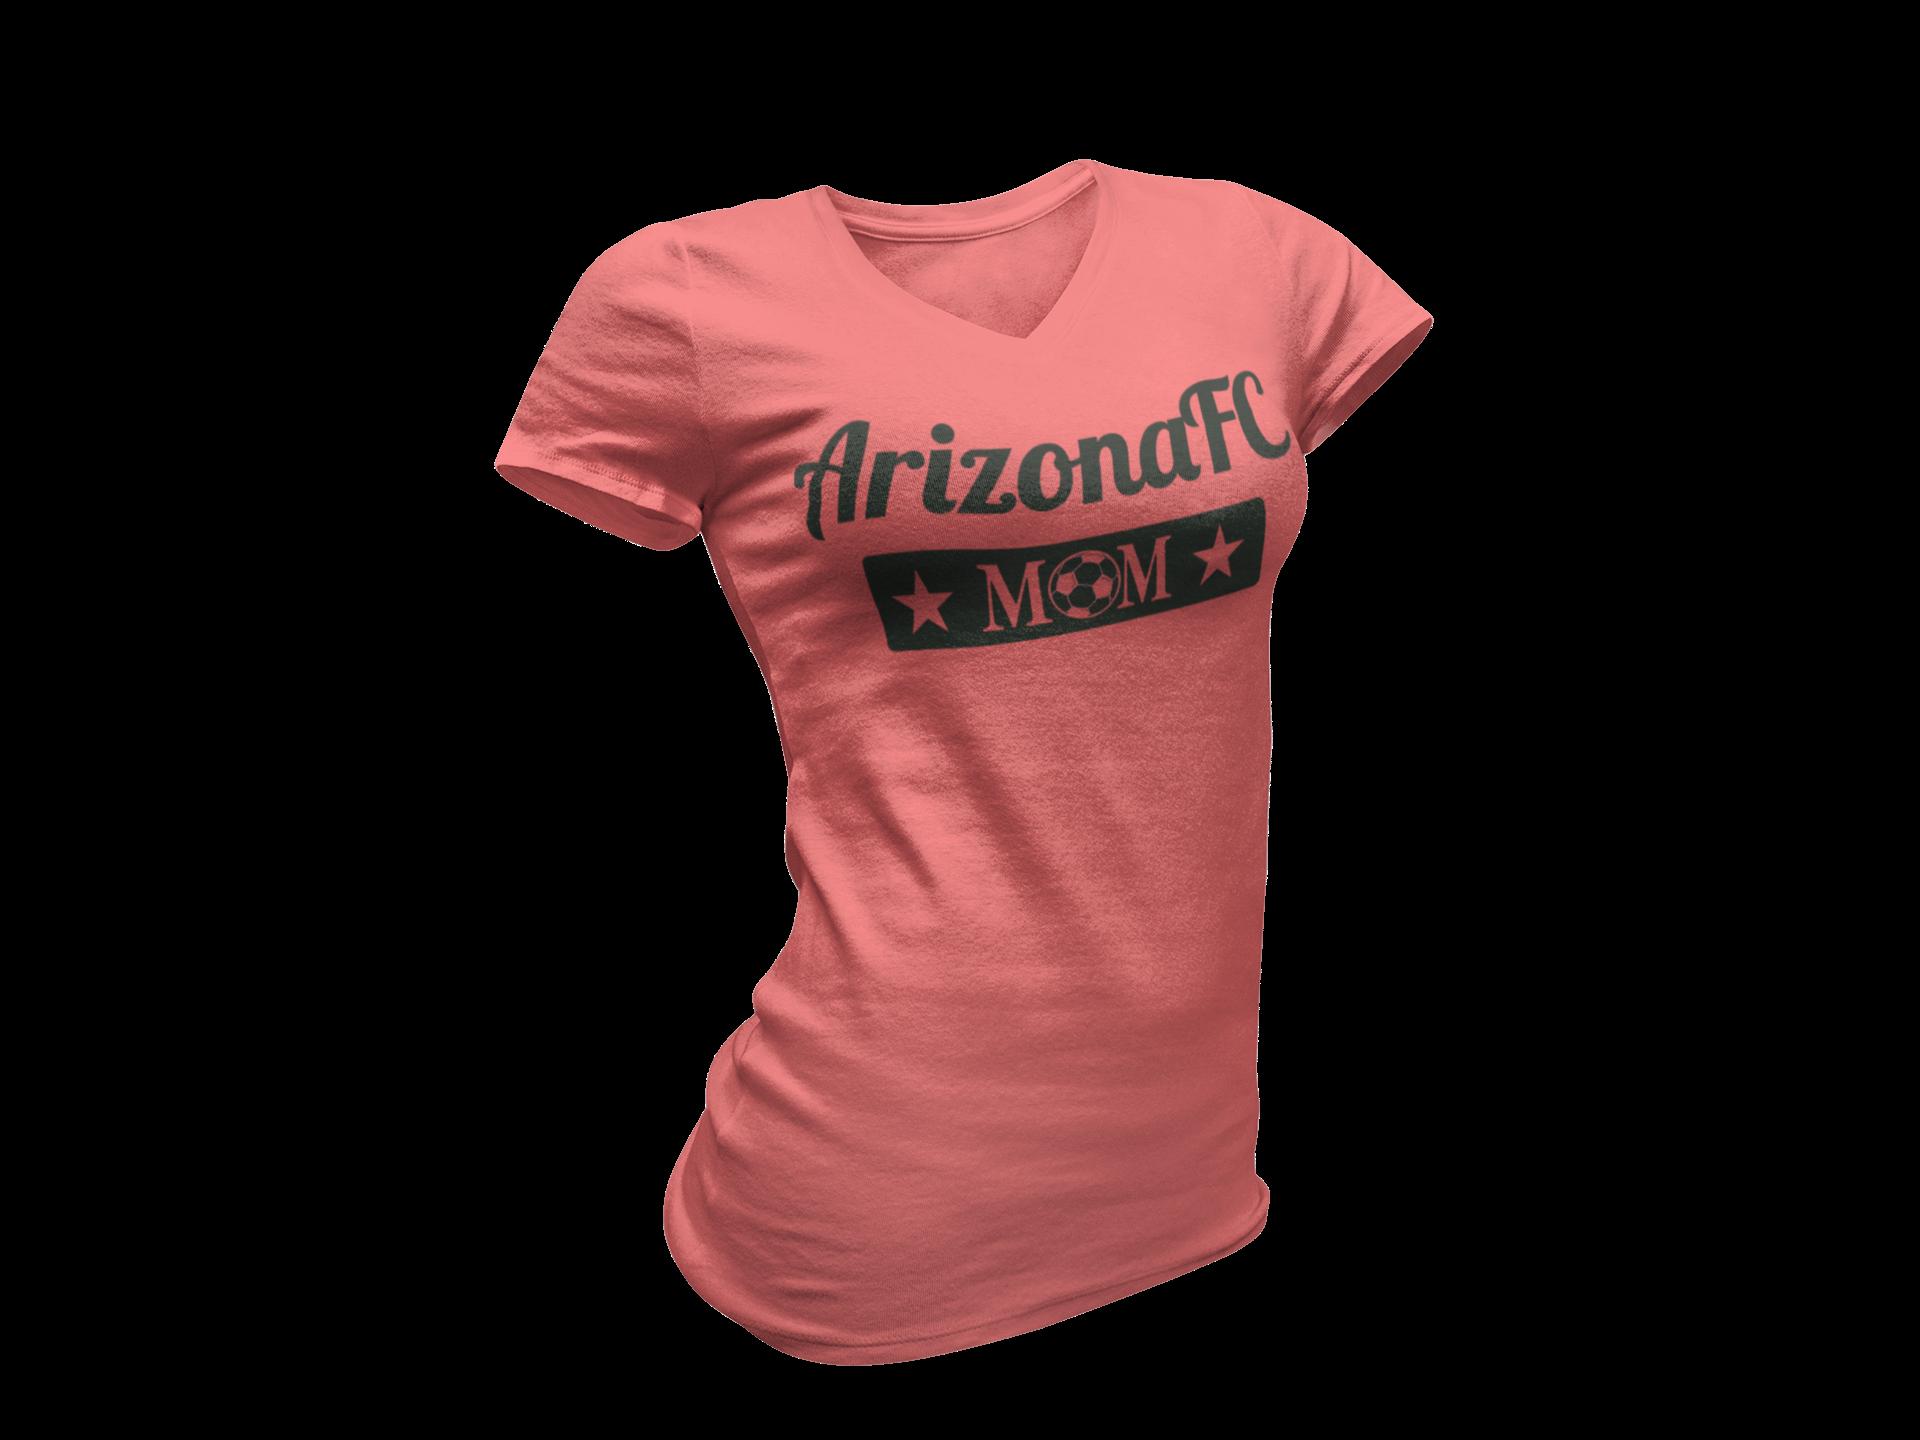 Arizona FC Mom 00001